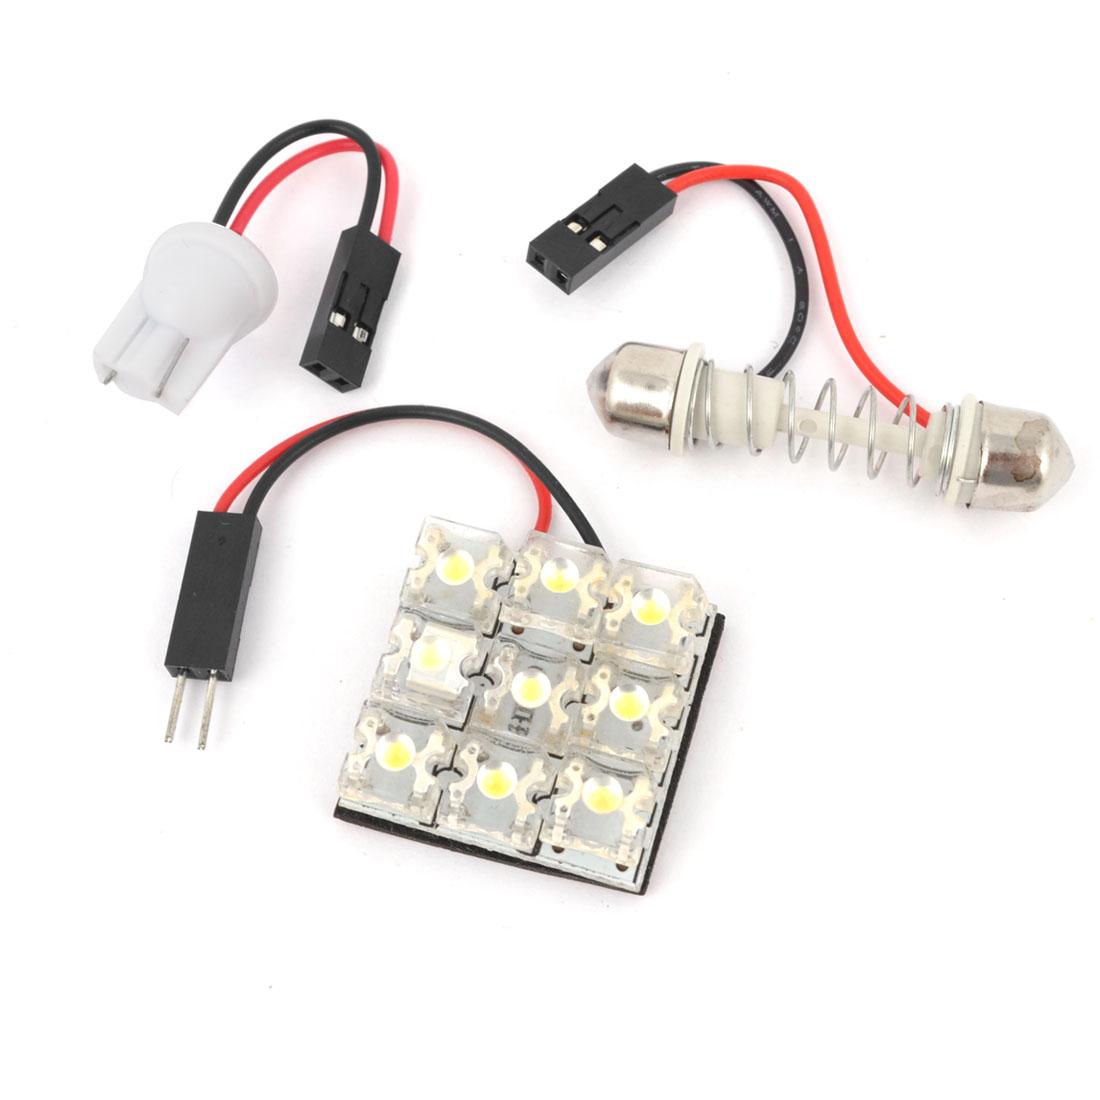 Internal Car Adhesive White 9-LED Panel Roof Dome Light w T10 Festoon Adapter